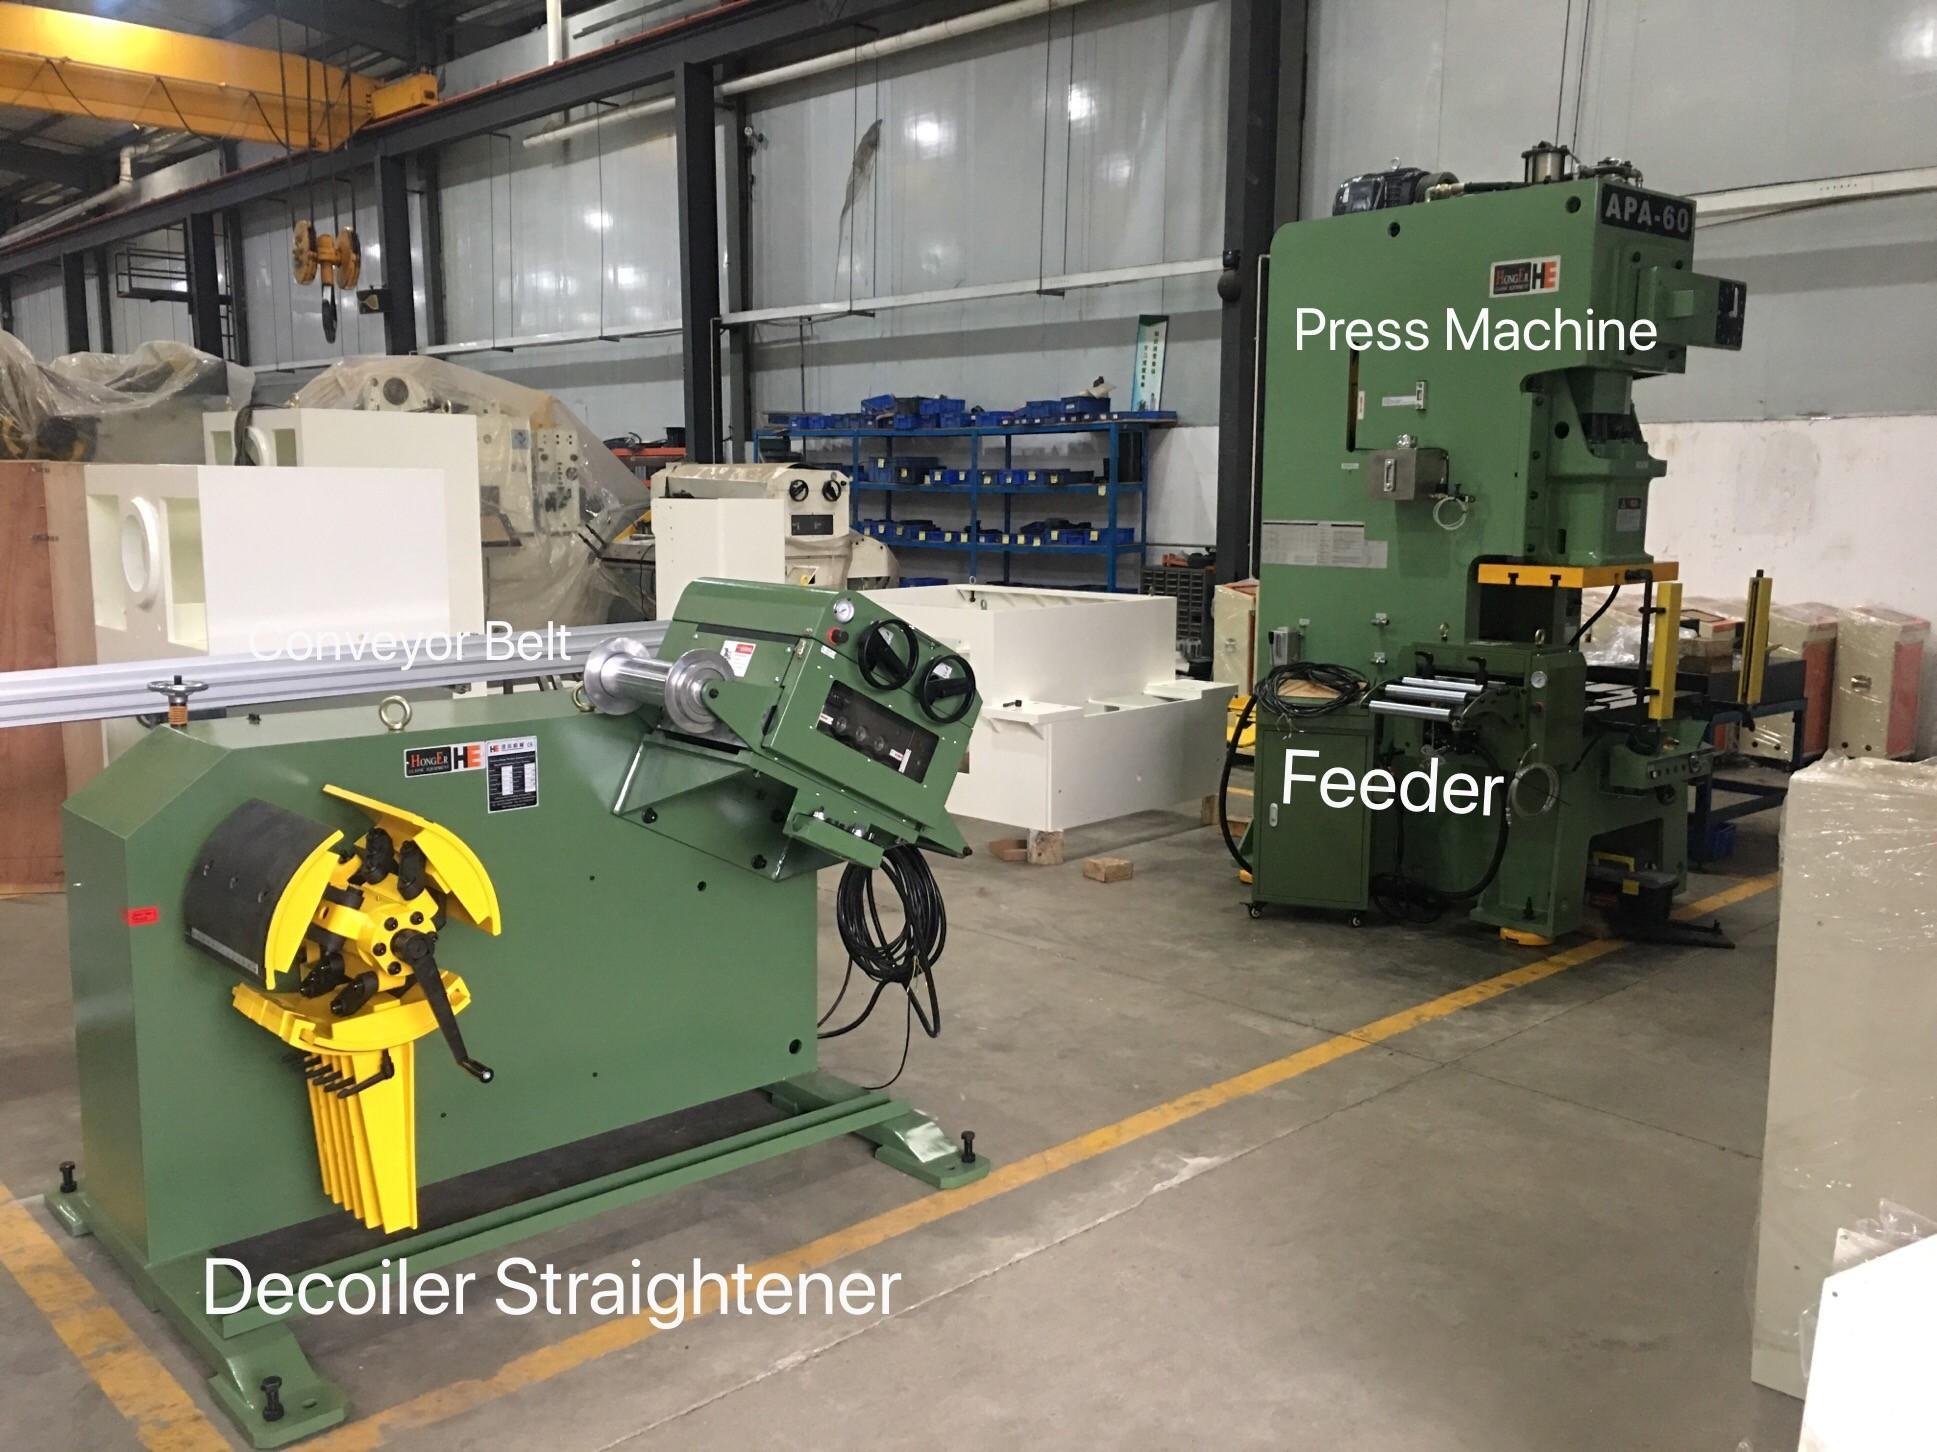 Power Press Machine for car lisence plates, APA-60